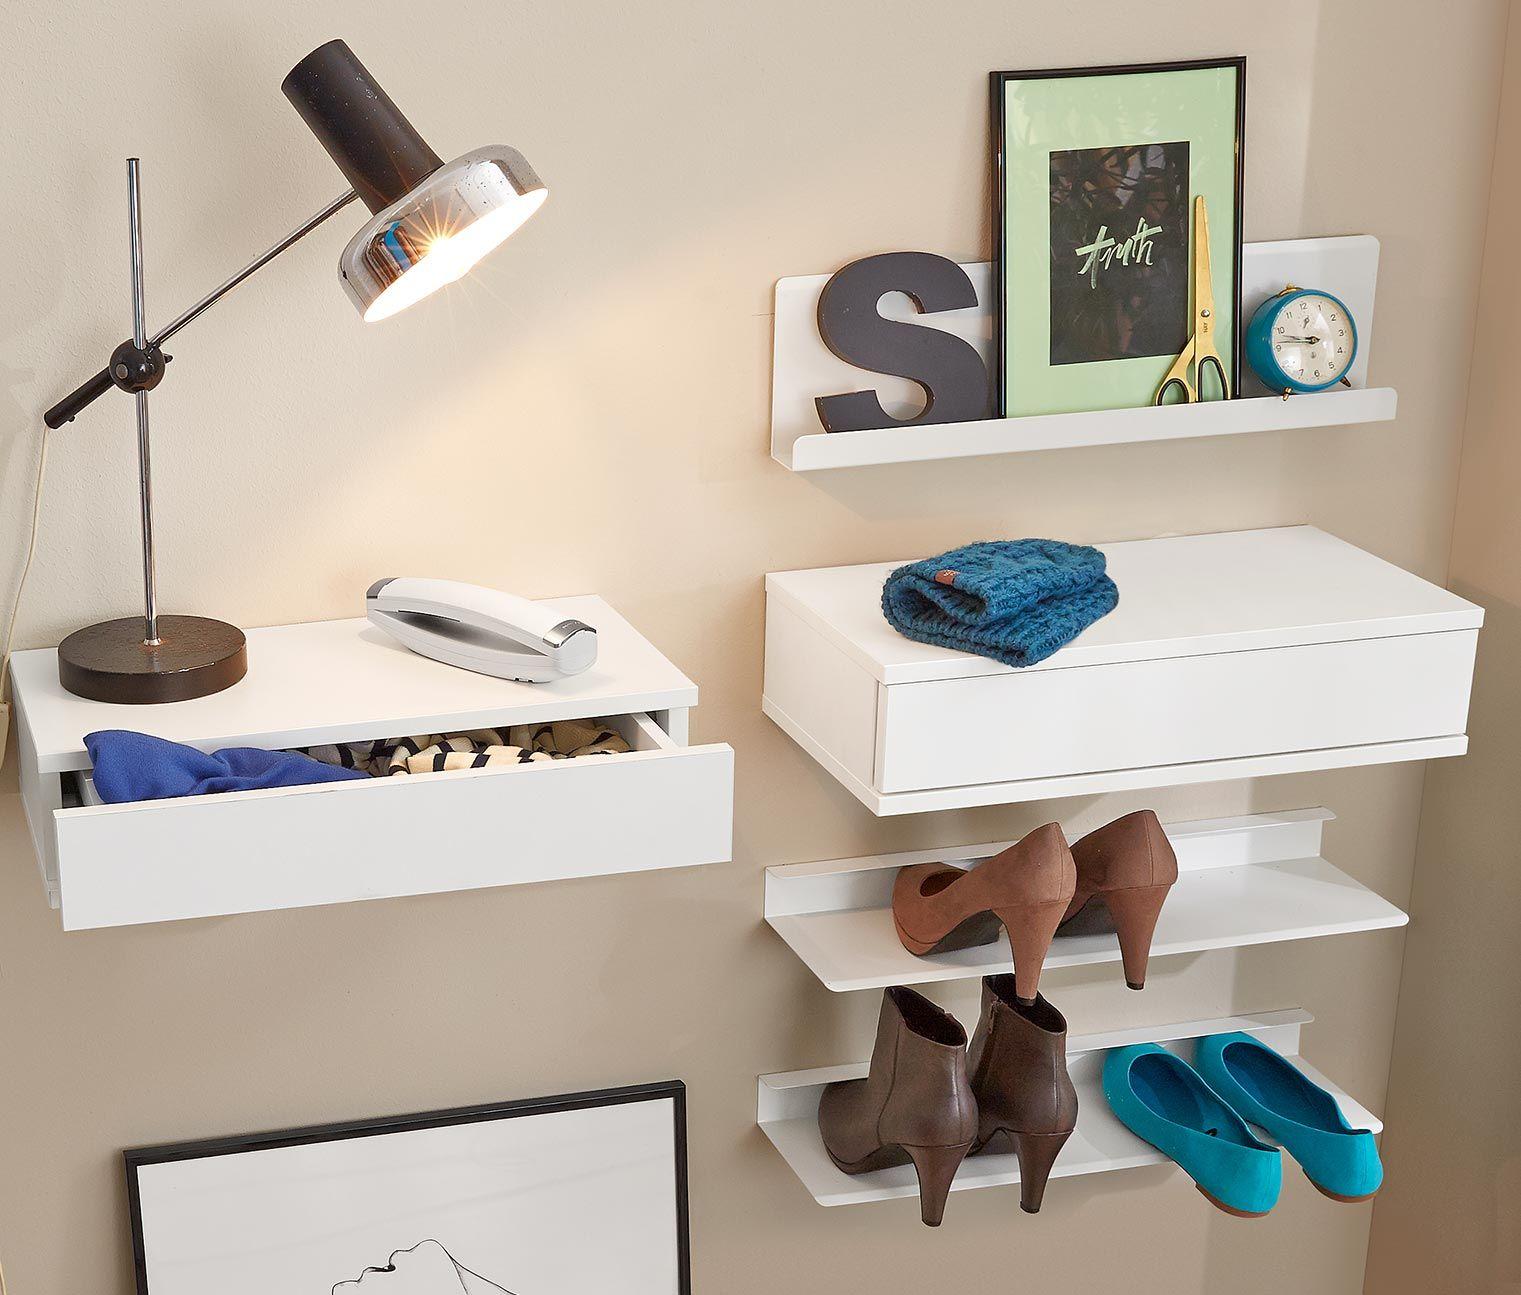 wandregal mit schublade 49 95 online cravings pinterest wandregal regal und wandregal. Black Bedroom Furniture Sets. Home Design Ideas